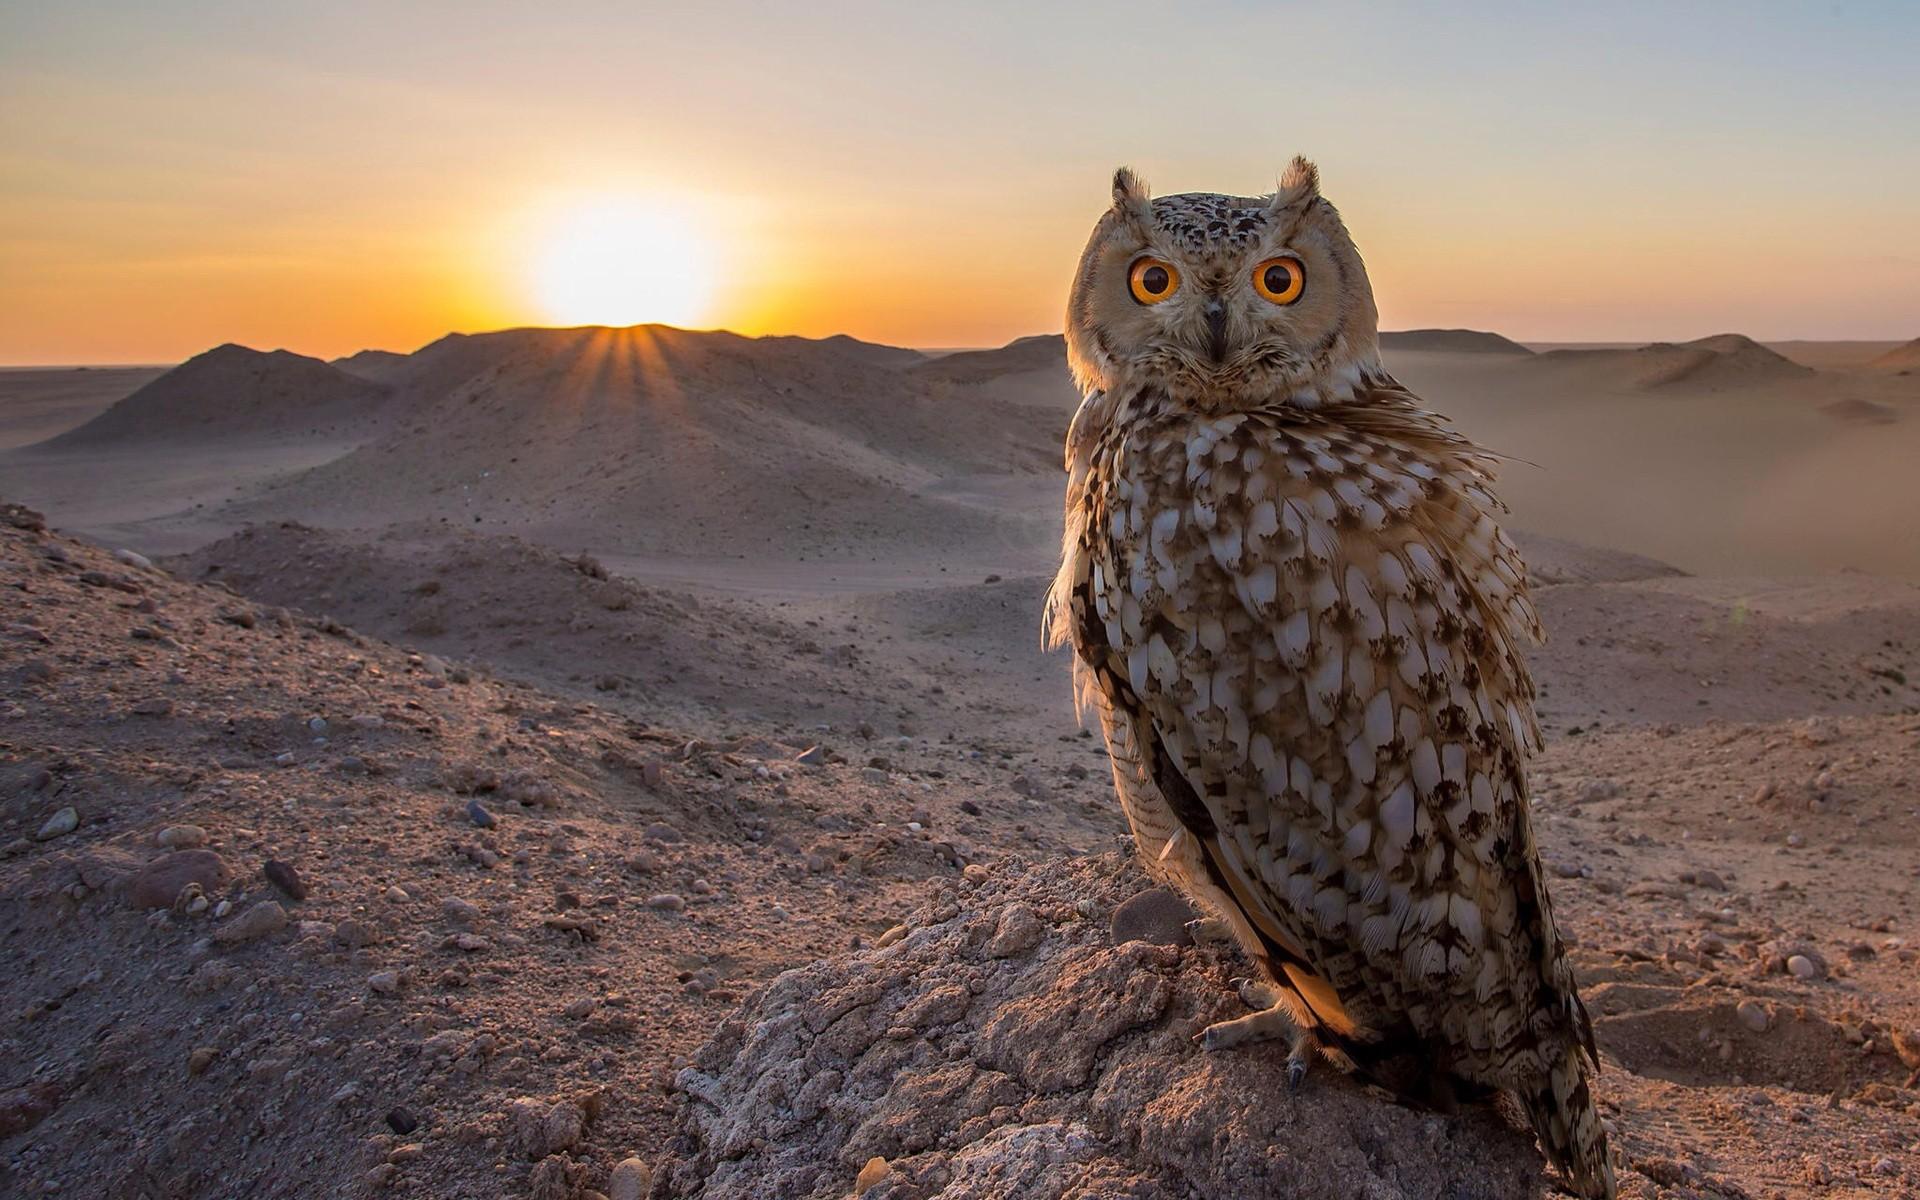 General 1920x1200 nature animals birds owl Sun sun rays landscape rock hills yellow eyes depth of field sky